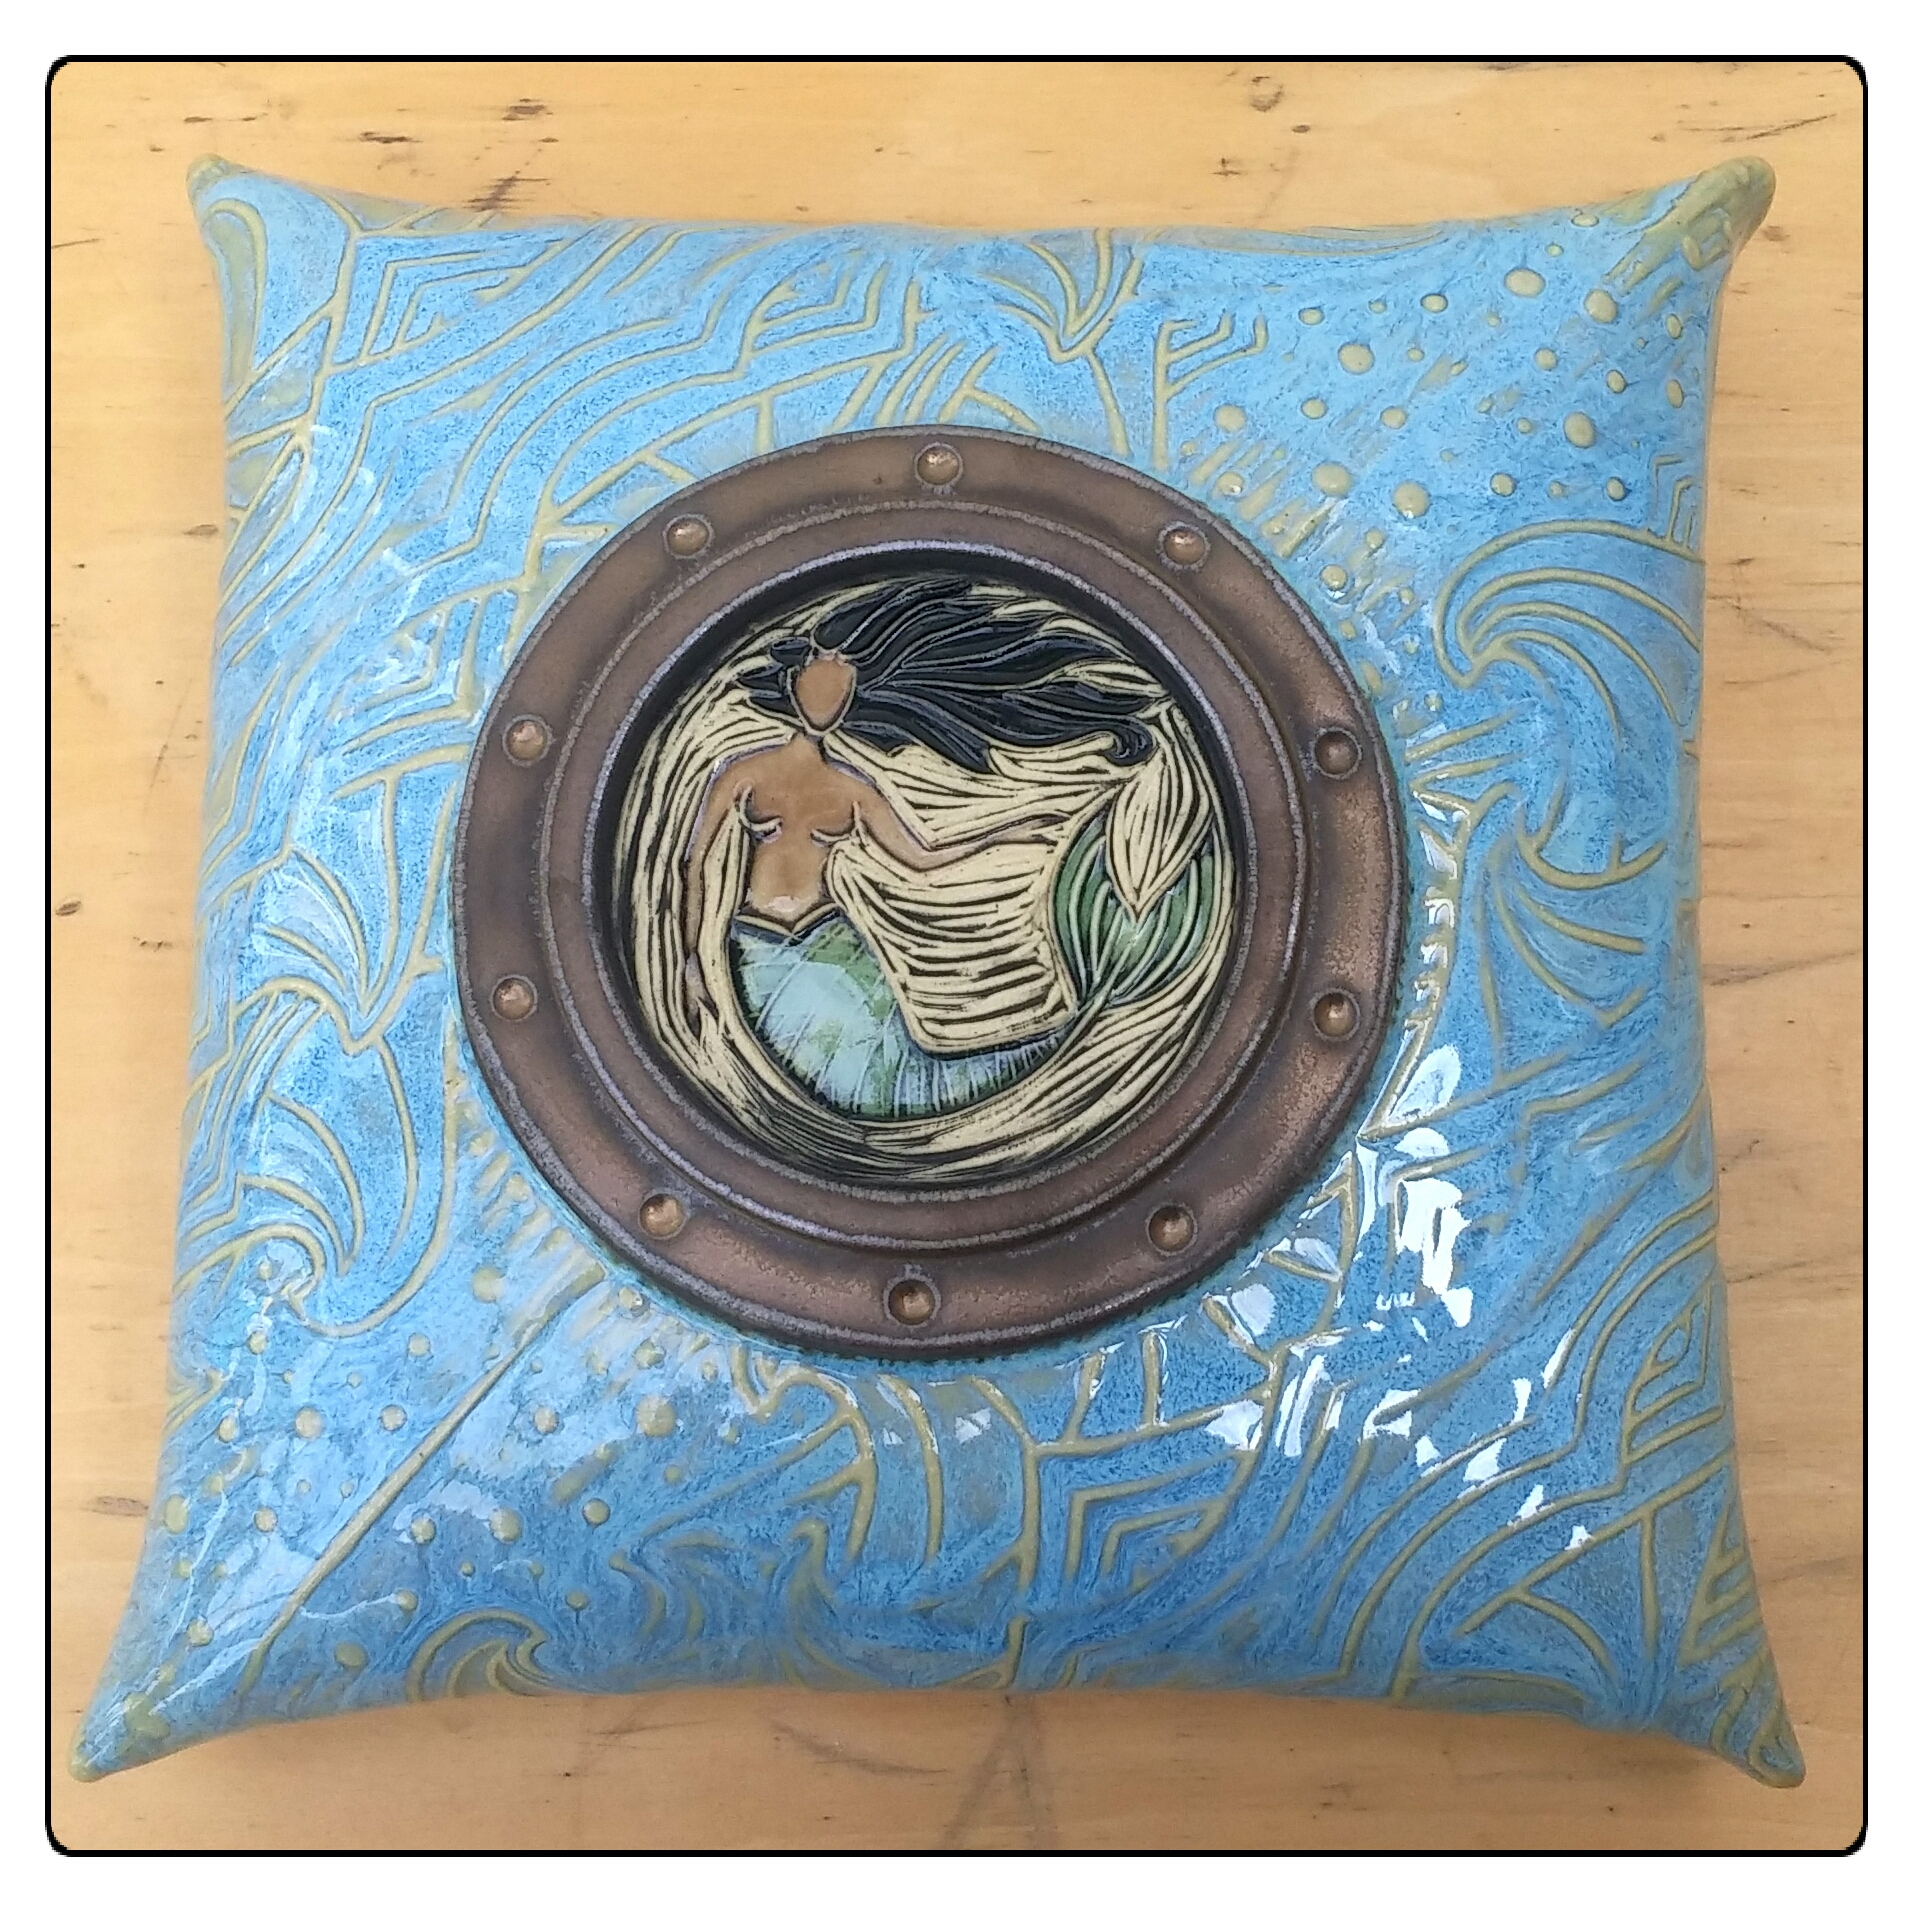 Porthole Mermaid Pillow